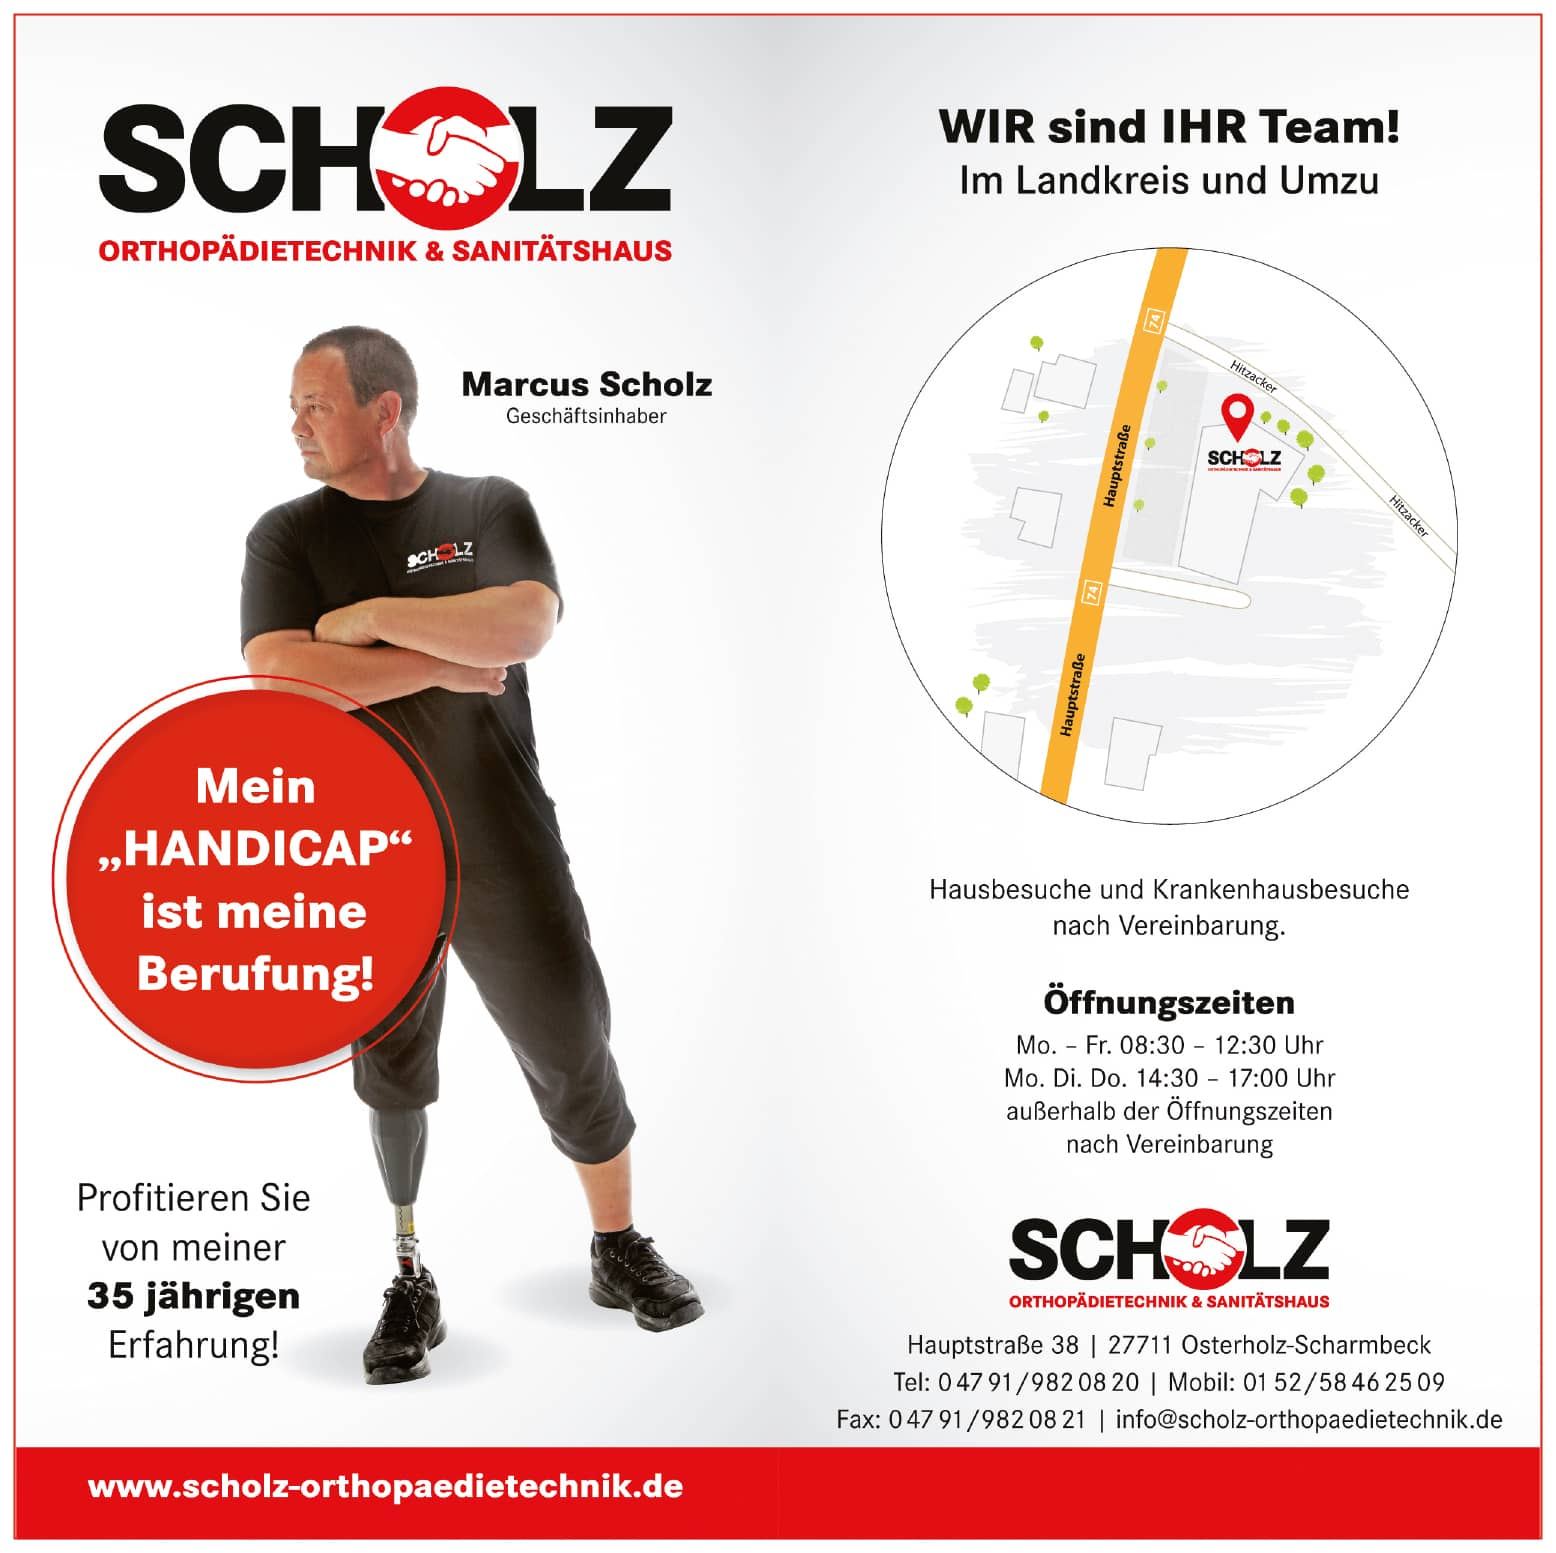 Scholz Orthopaedietechnik